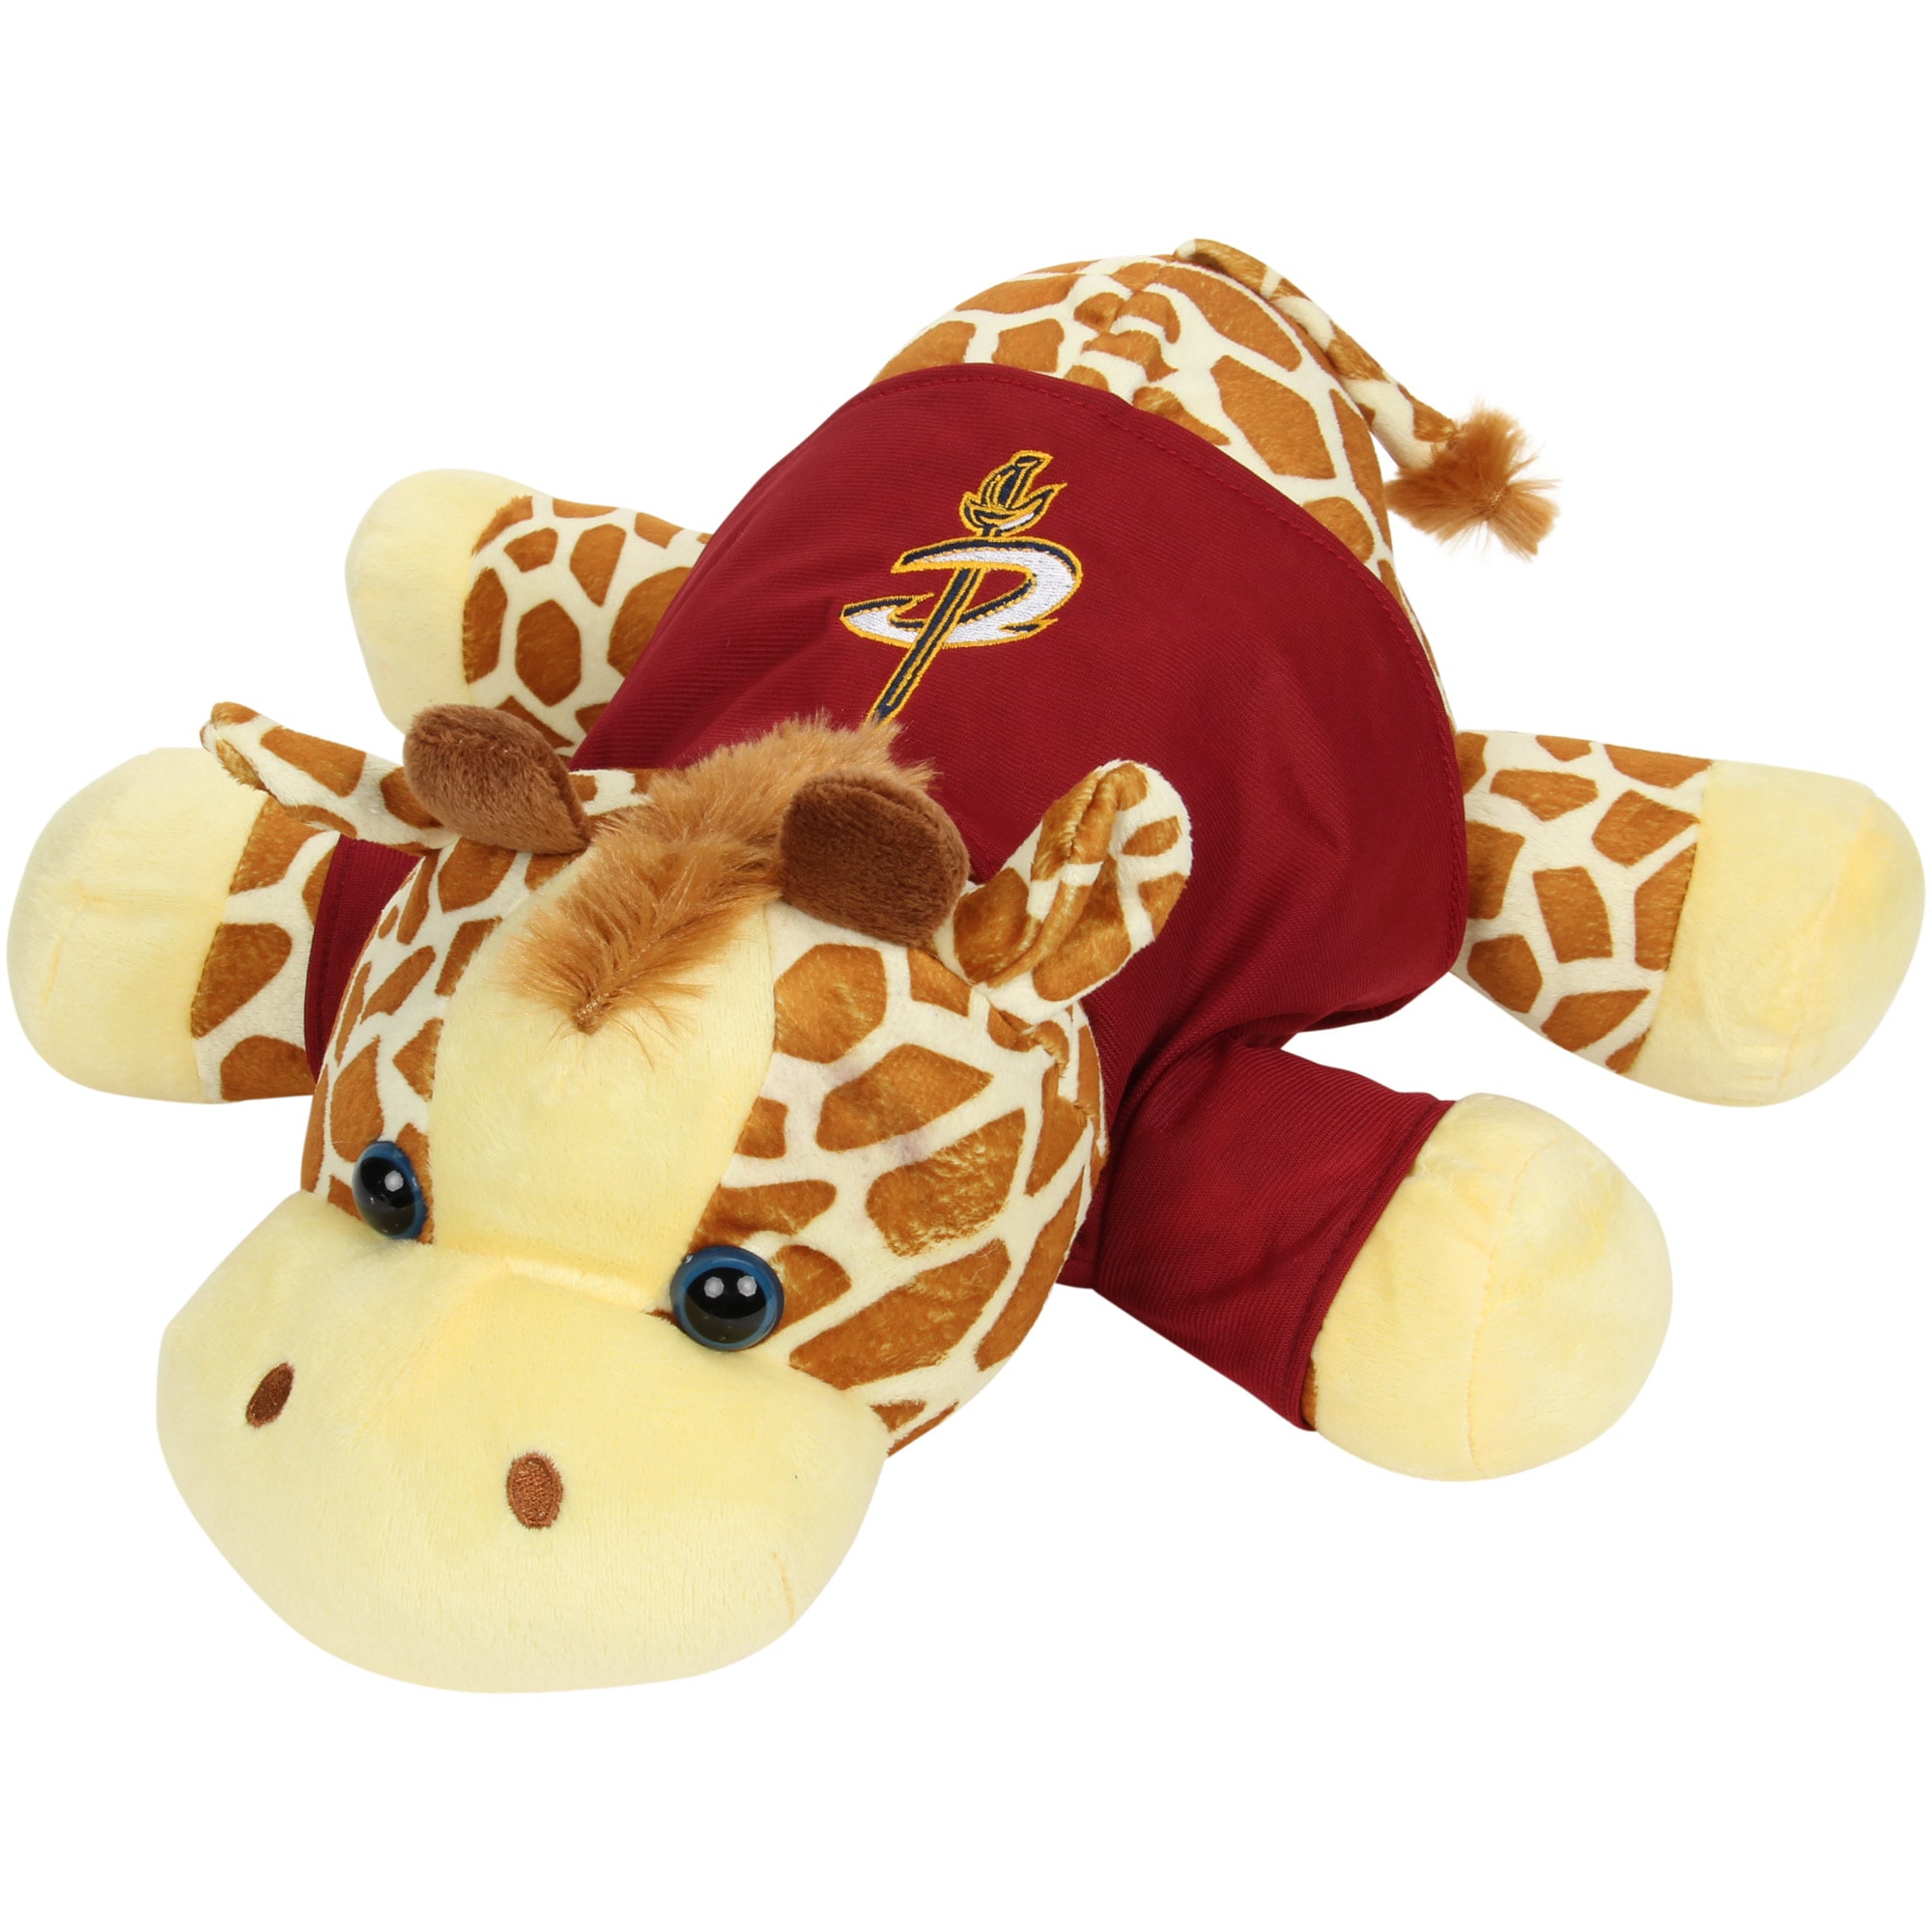 "Cleveland Cavaliers 13"" Floppy Feet Giraffe"